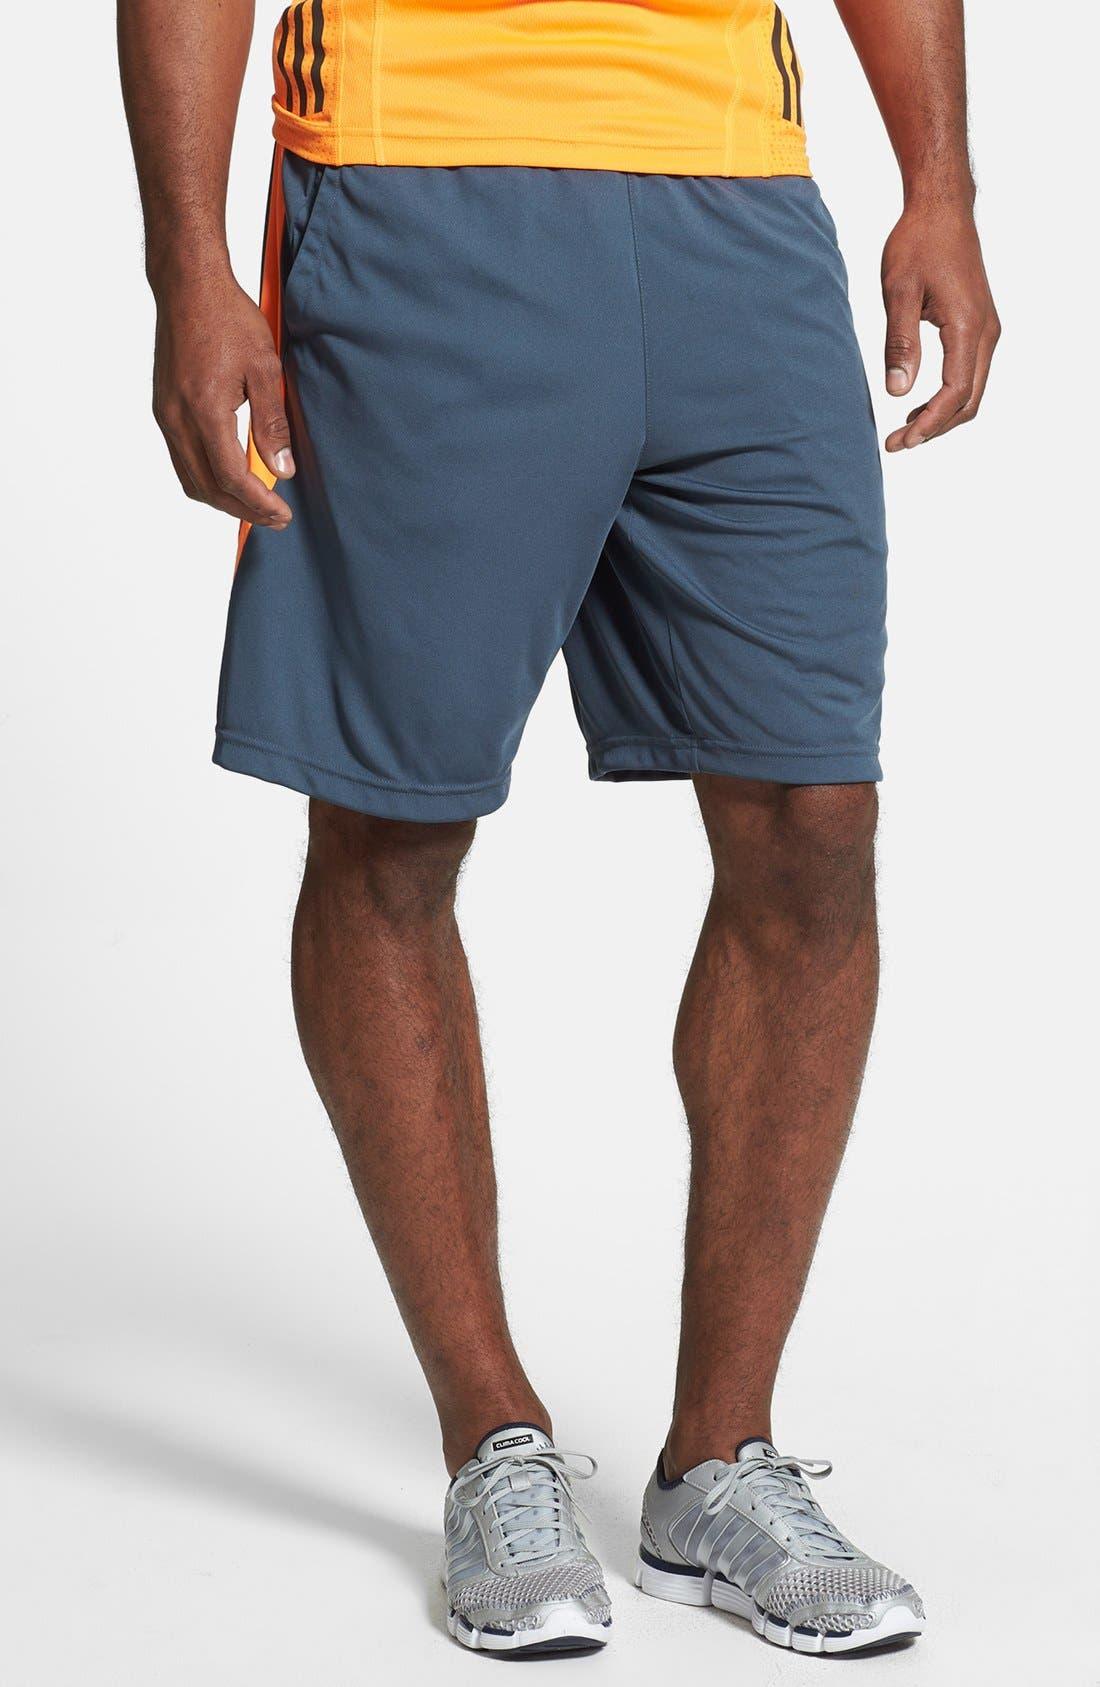 Alternate Image 1 Selected - adidas 'Ultimate Swat' Shorts